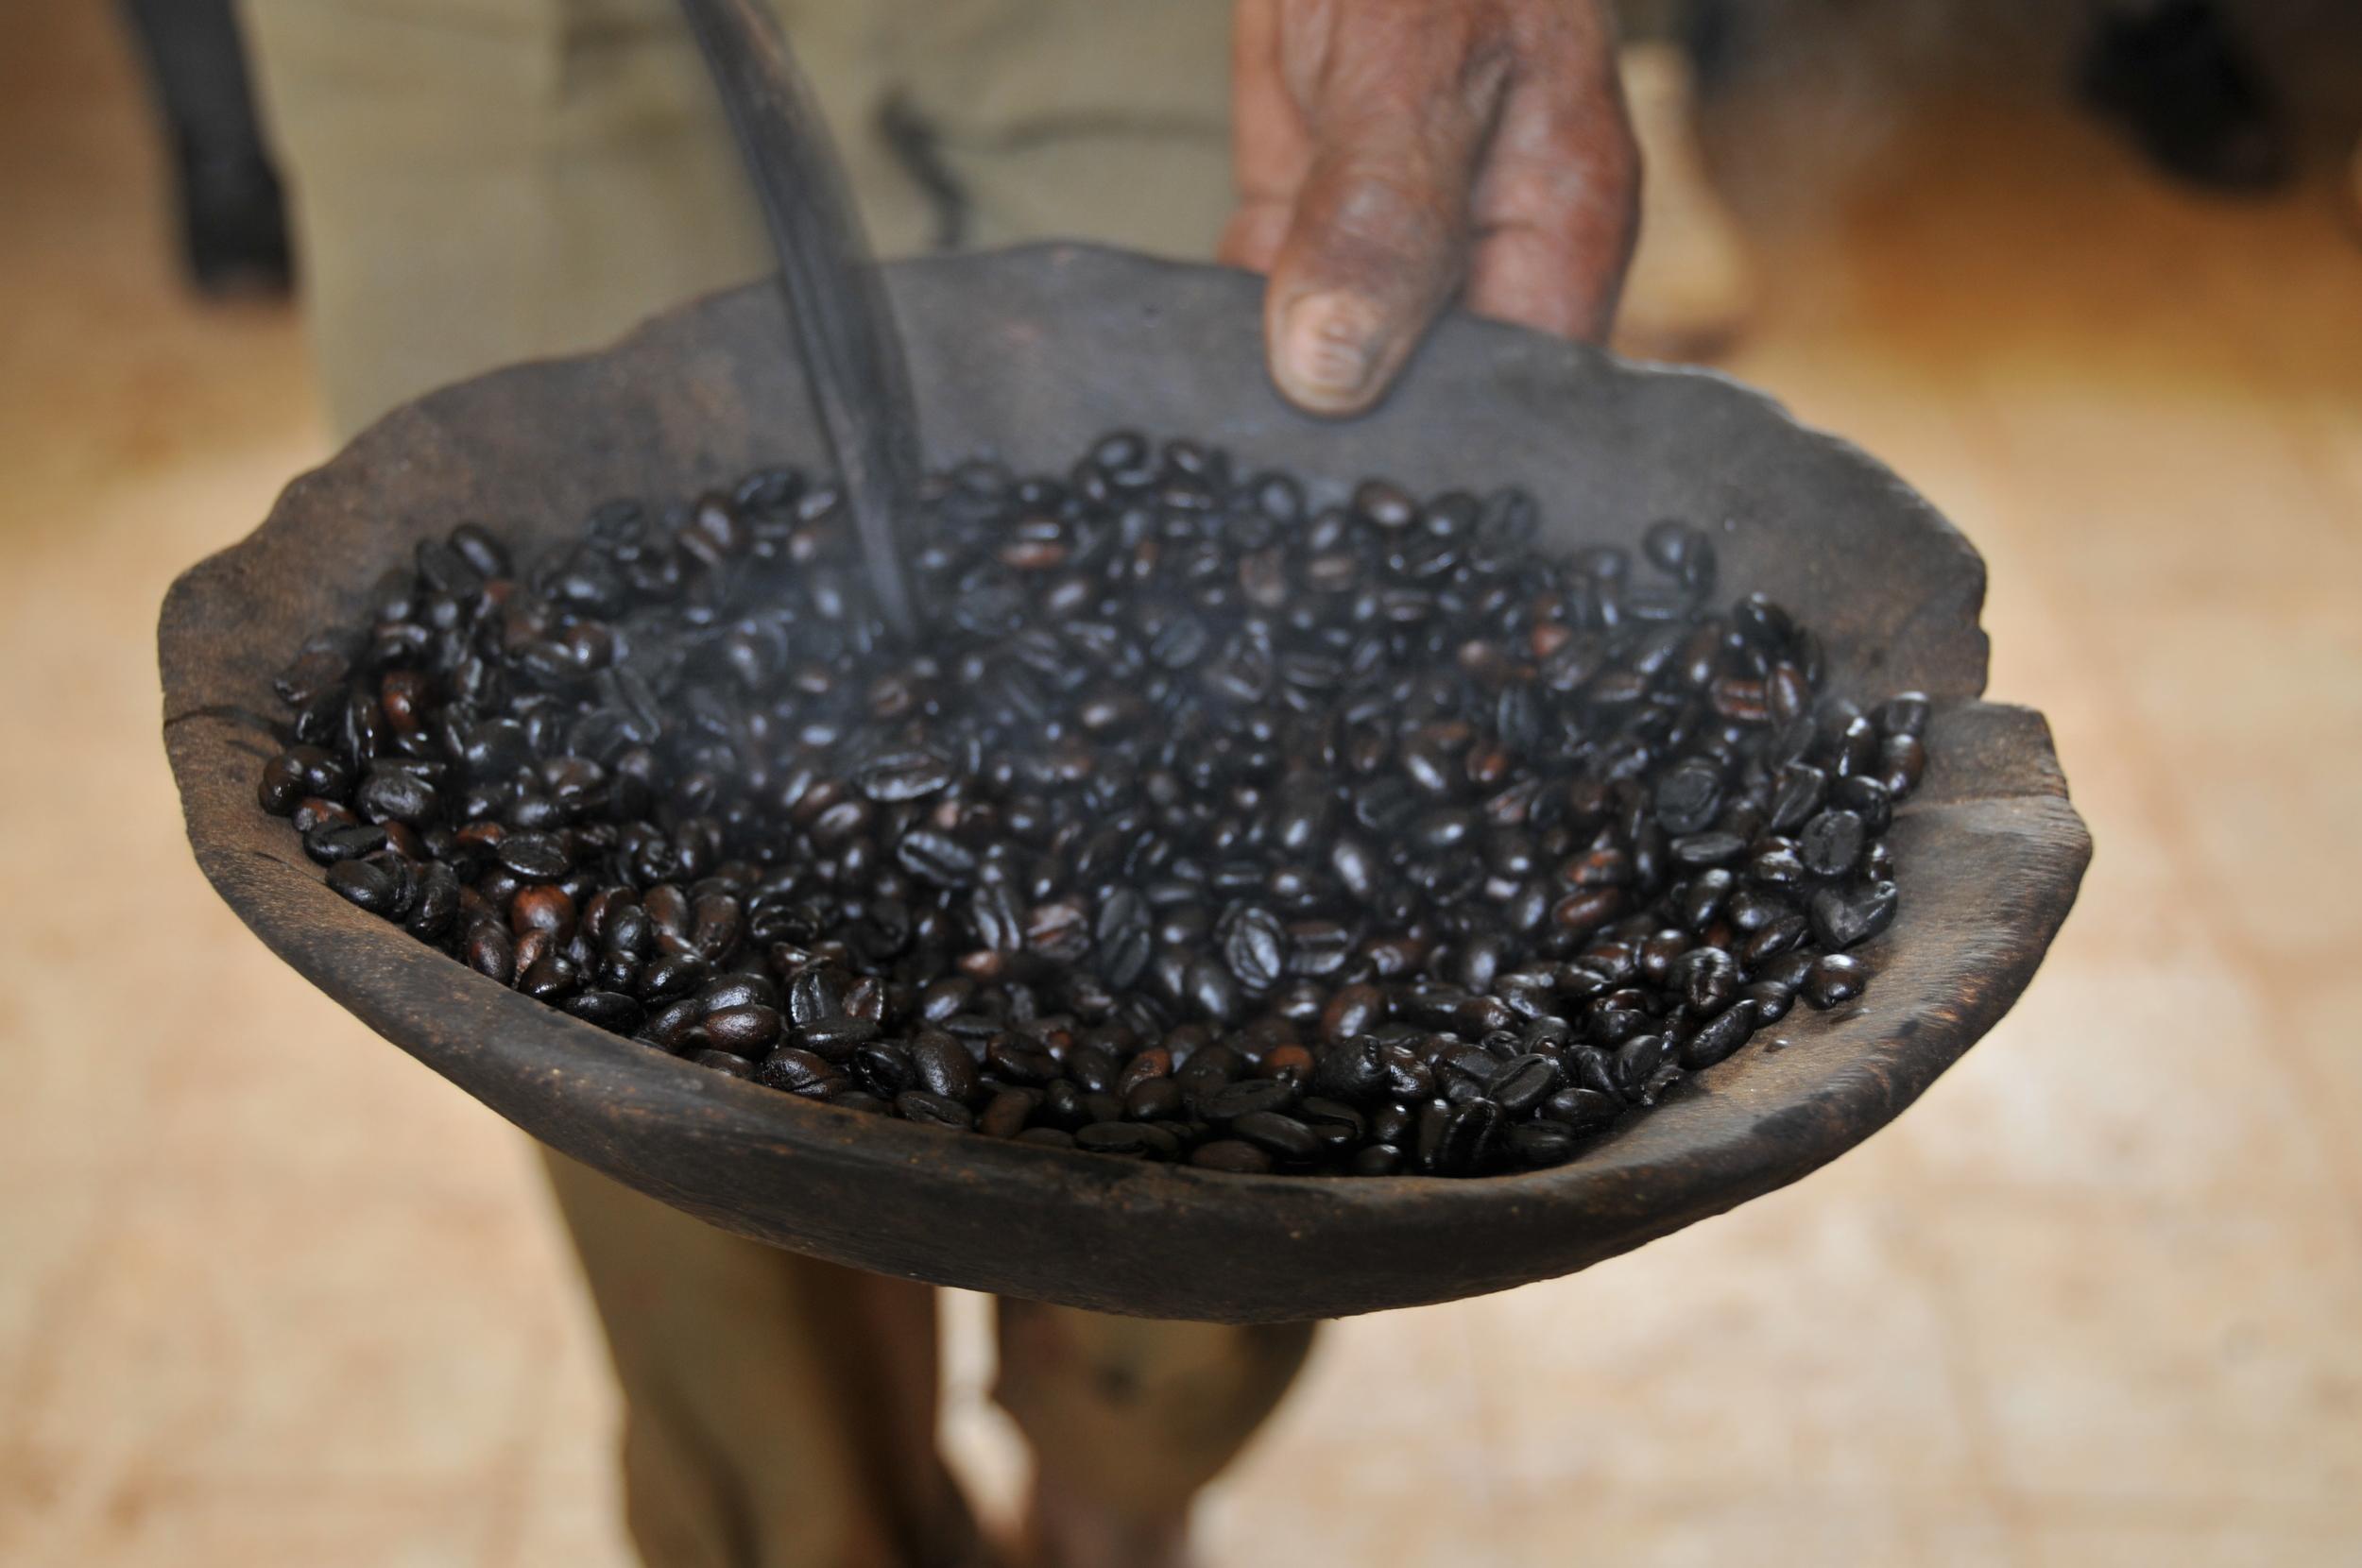 Roasted ethiopia coffee